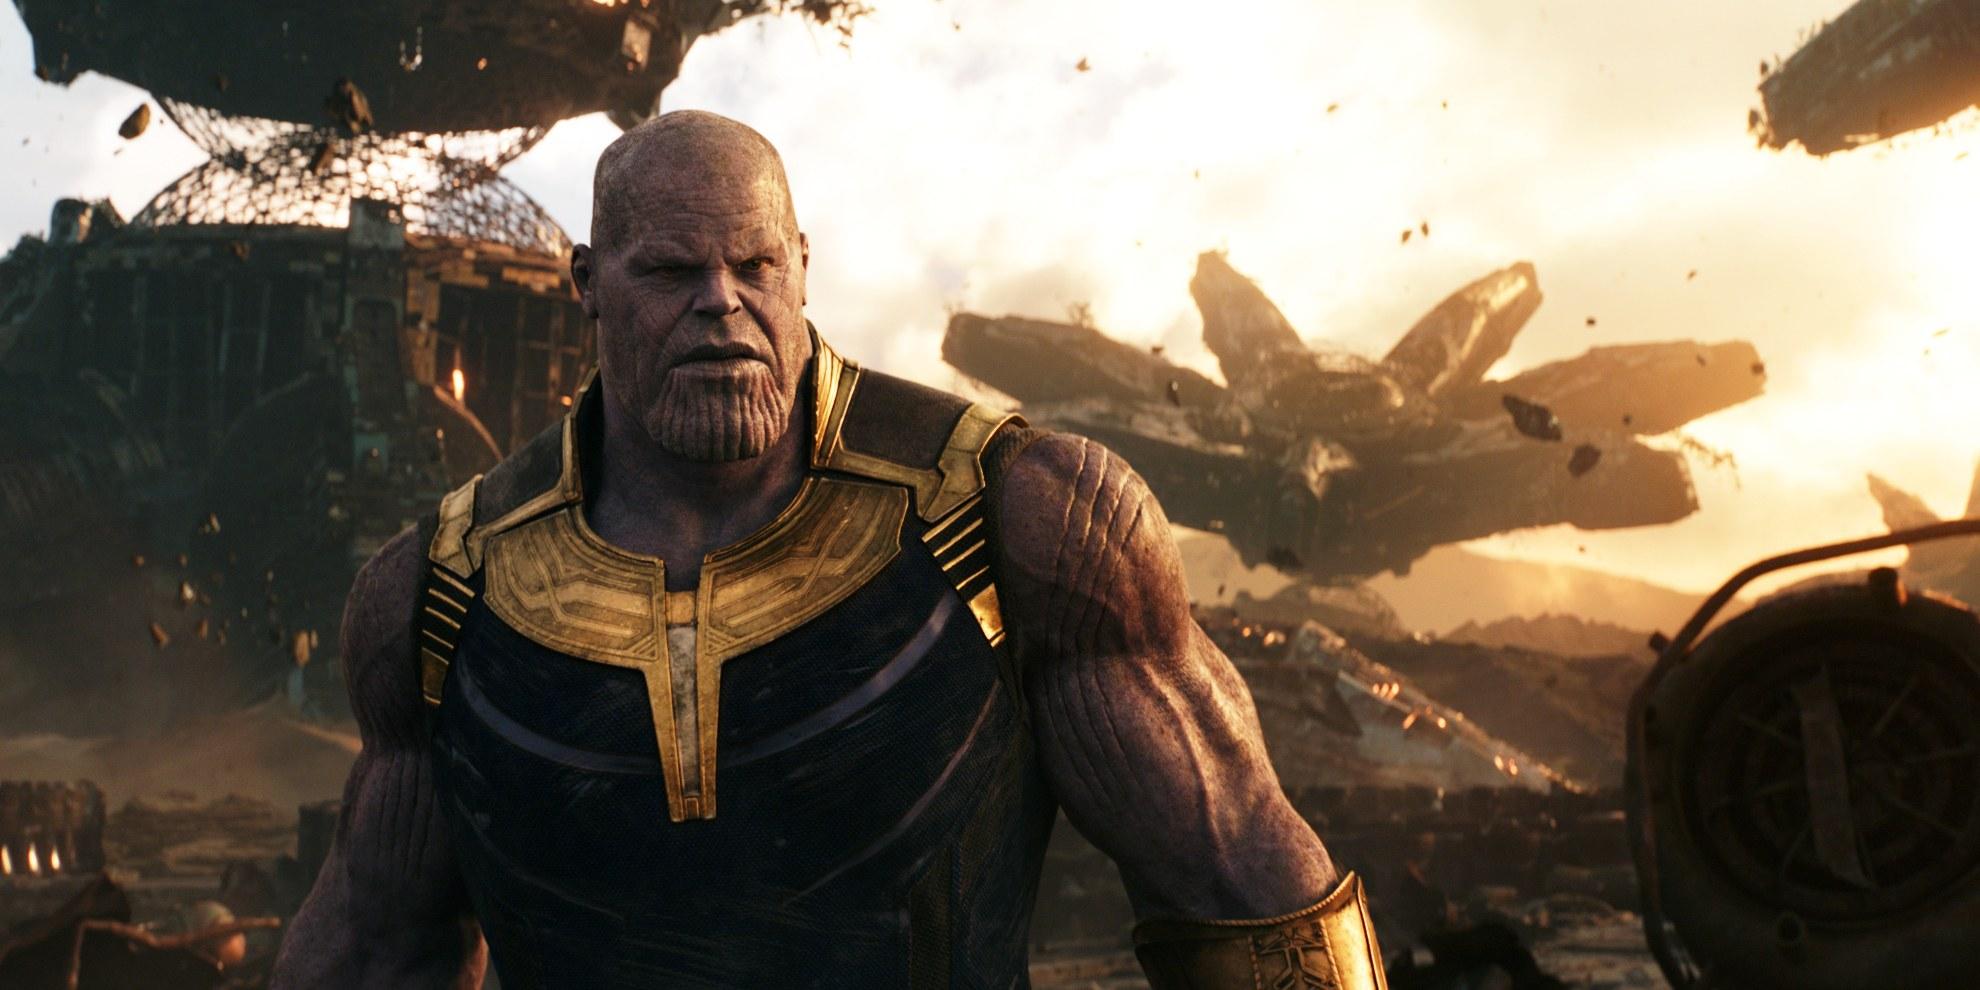 Josh Brolin as Thanos in Avengers: Infinity War